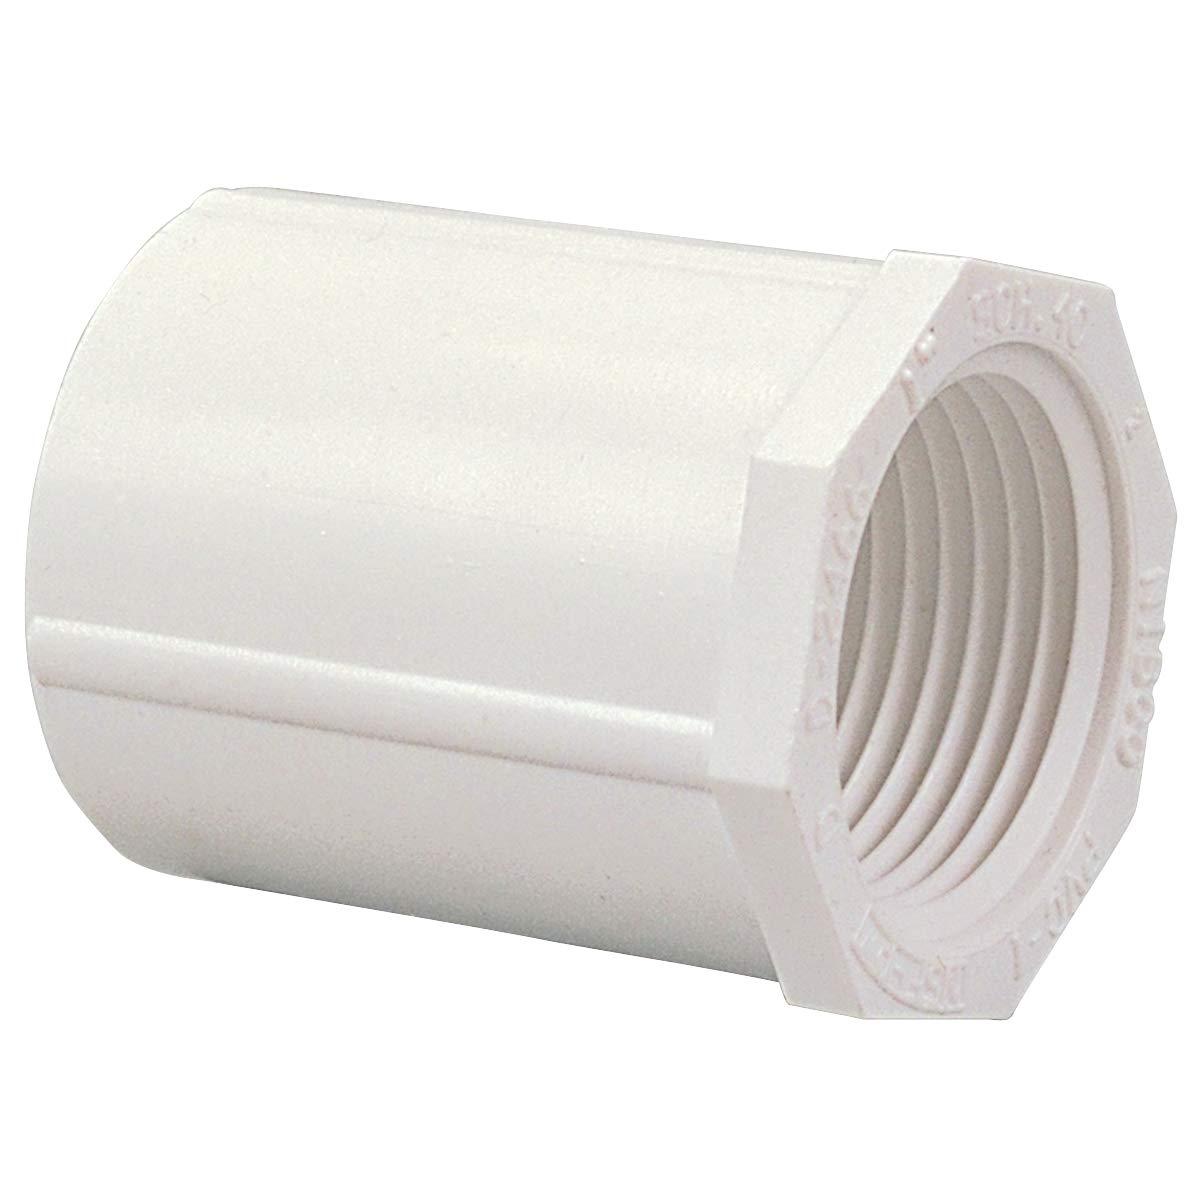 435-074 1//2X3//4 Slip x FIPT Female Adapter PVC 40